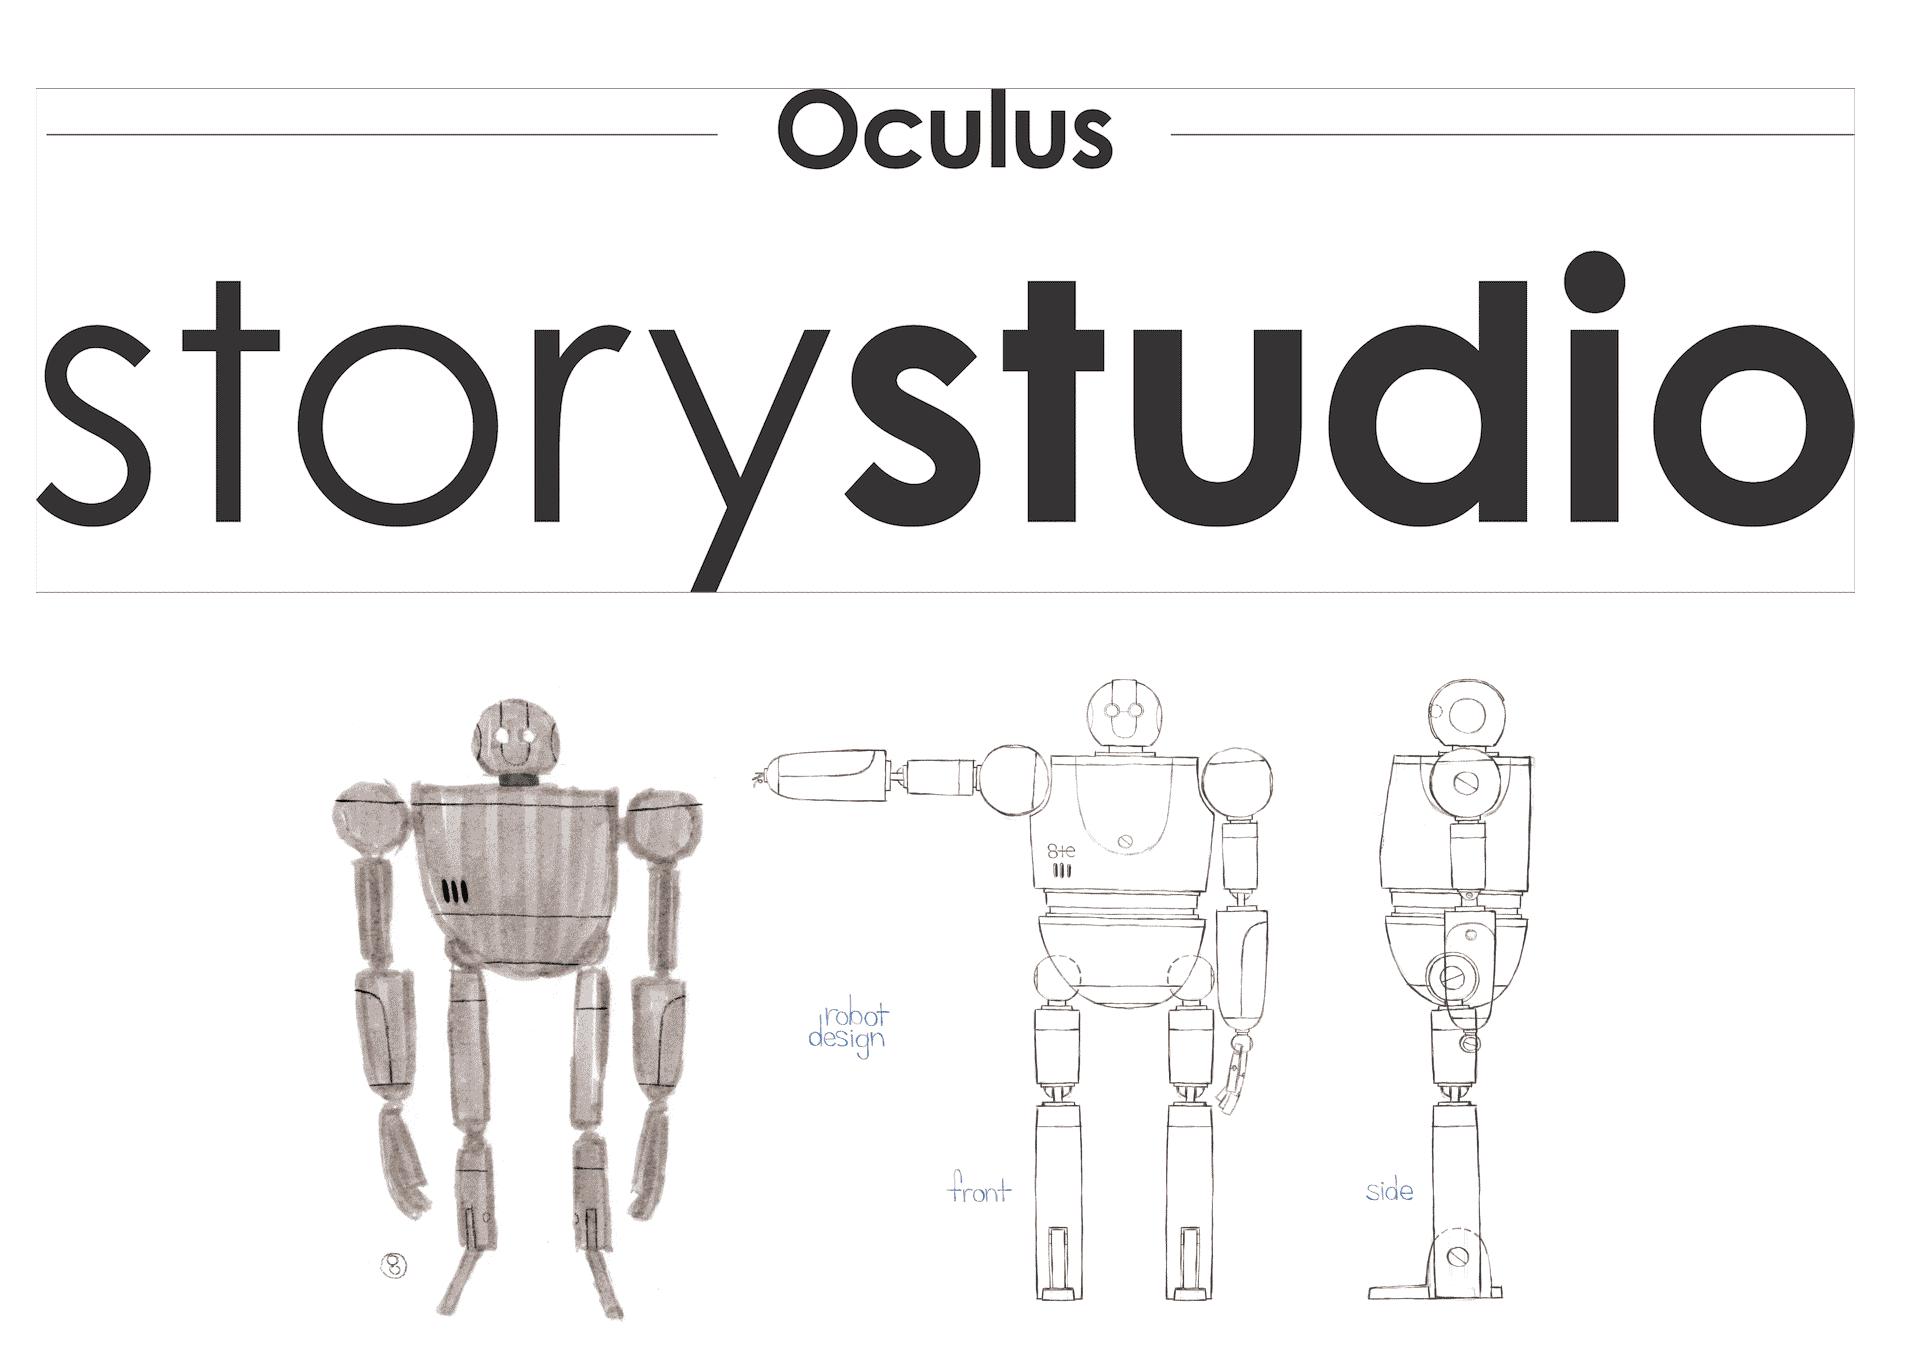 oculus-storystudio